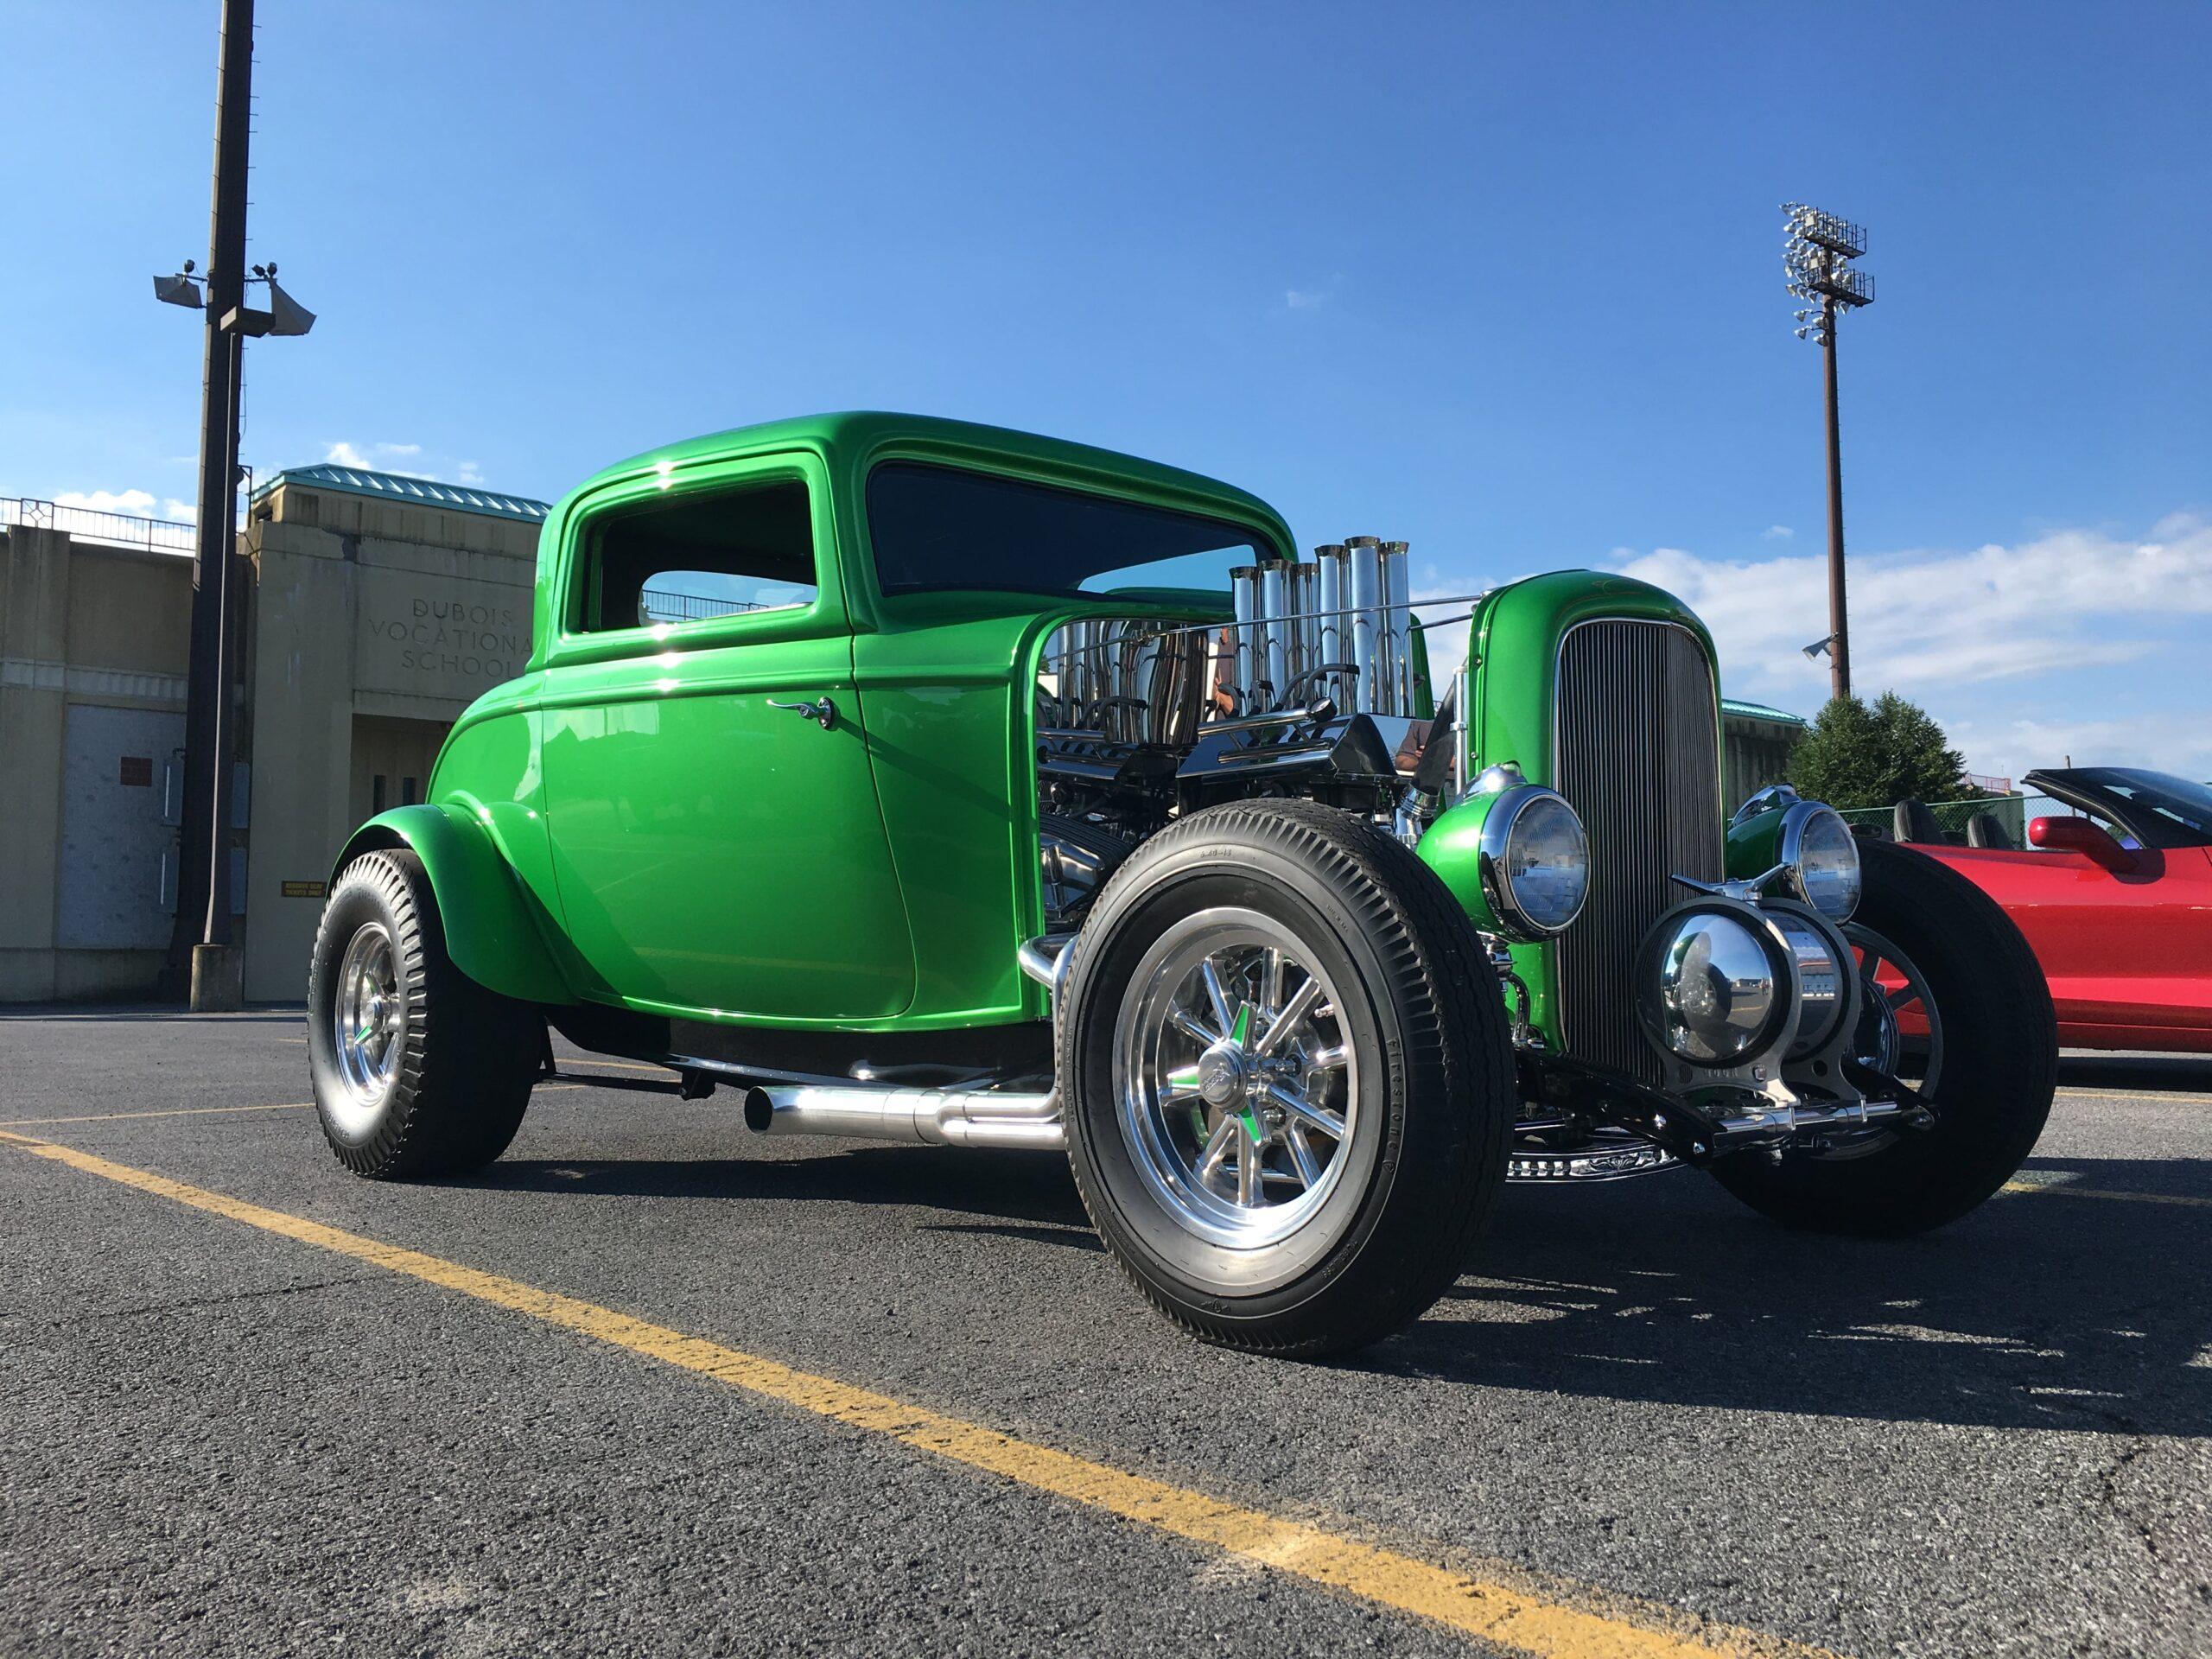 Ed lanzoni - Dubois, PA - 1932 Ford Coupe